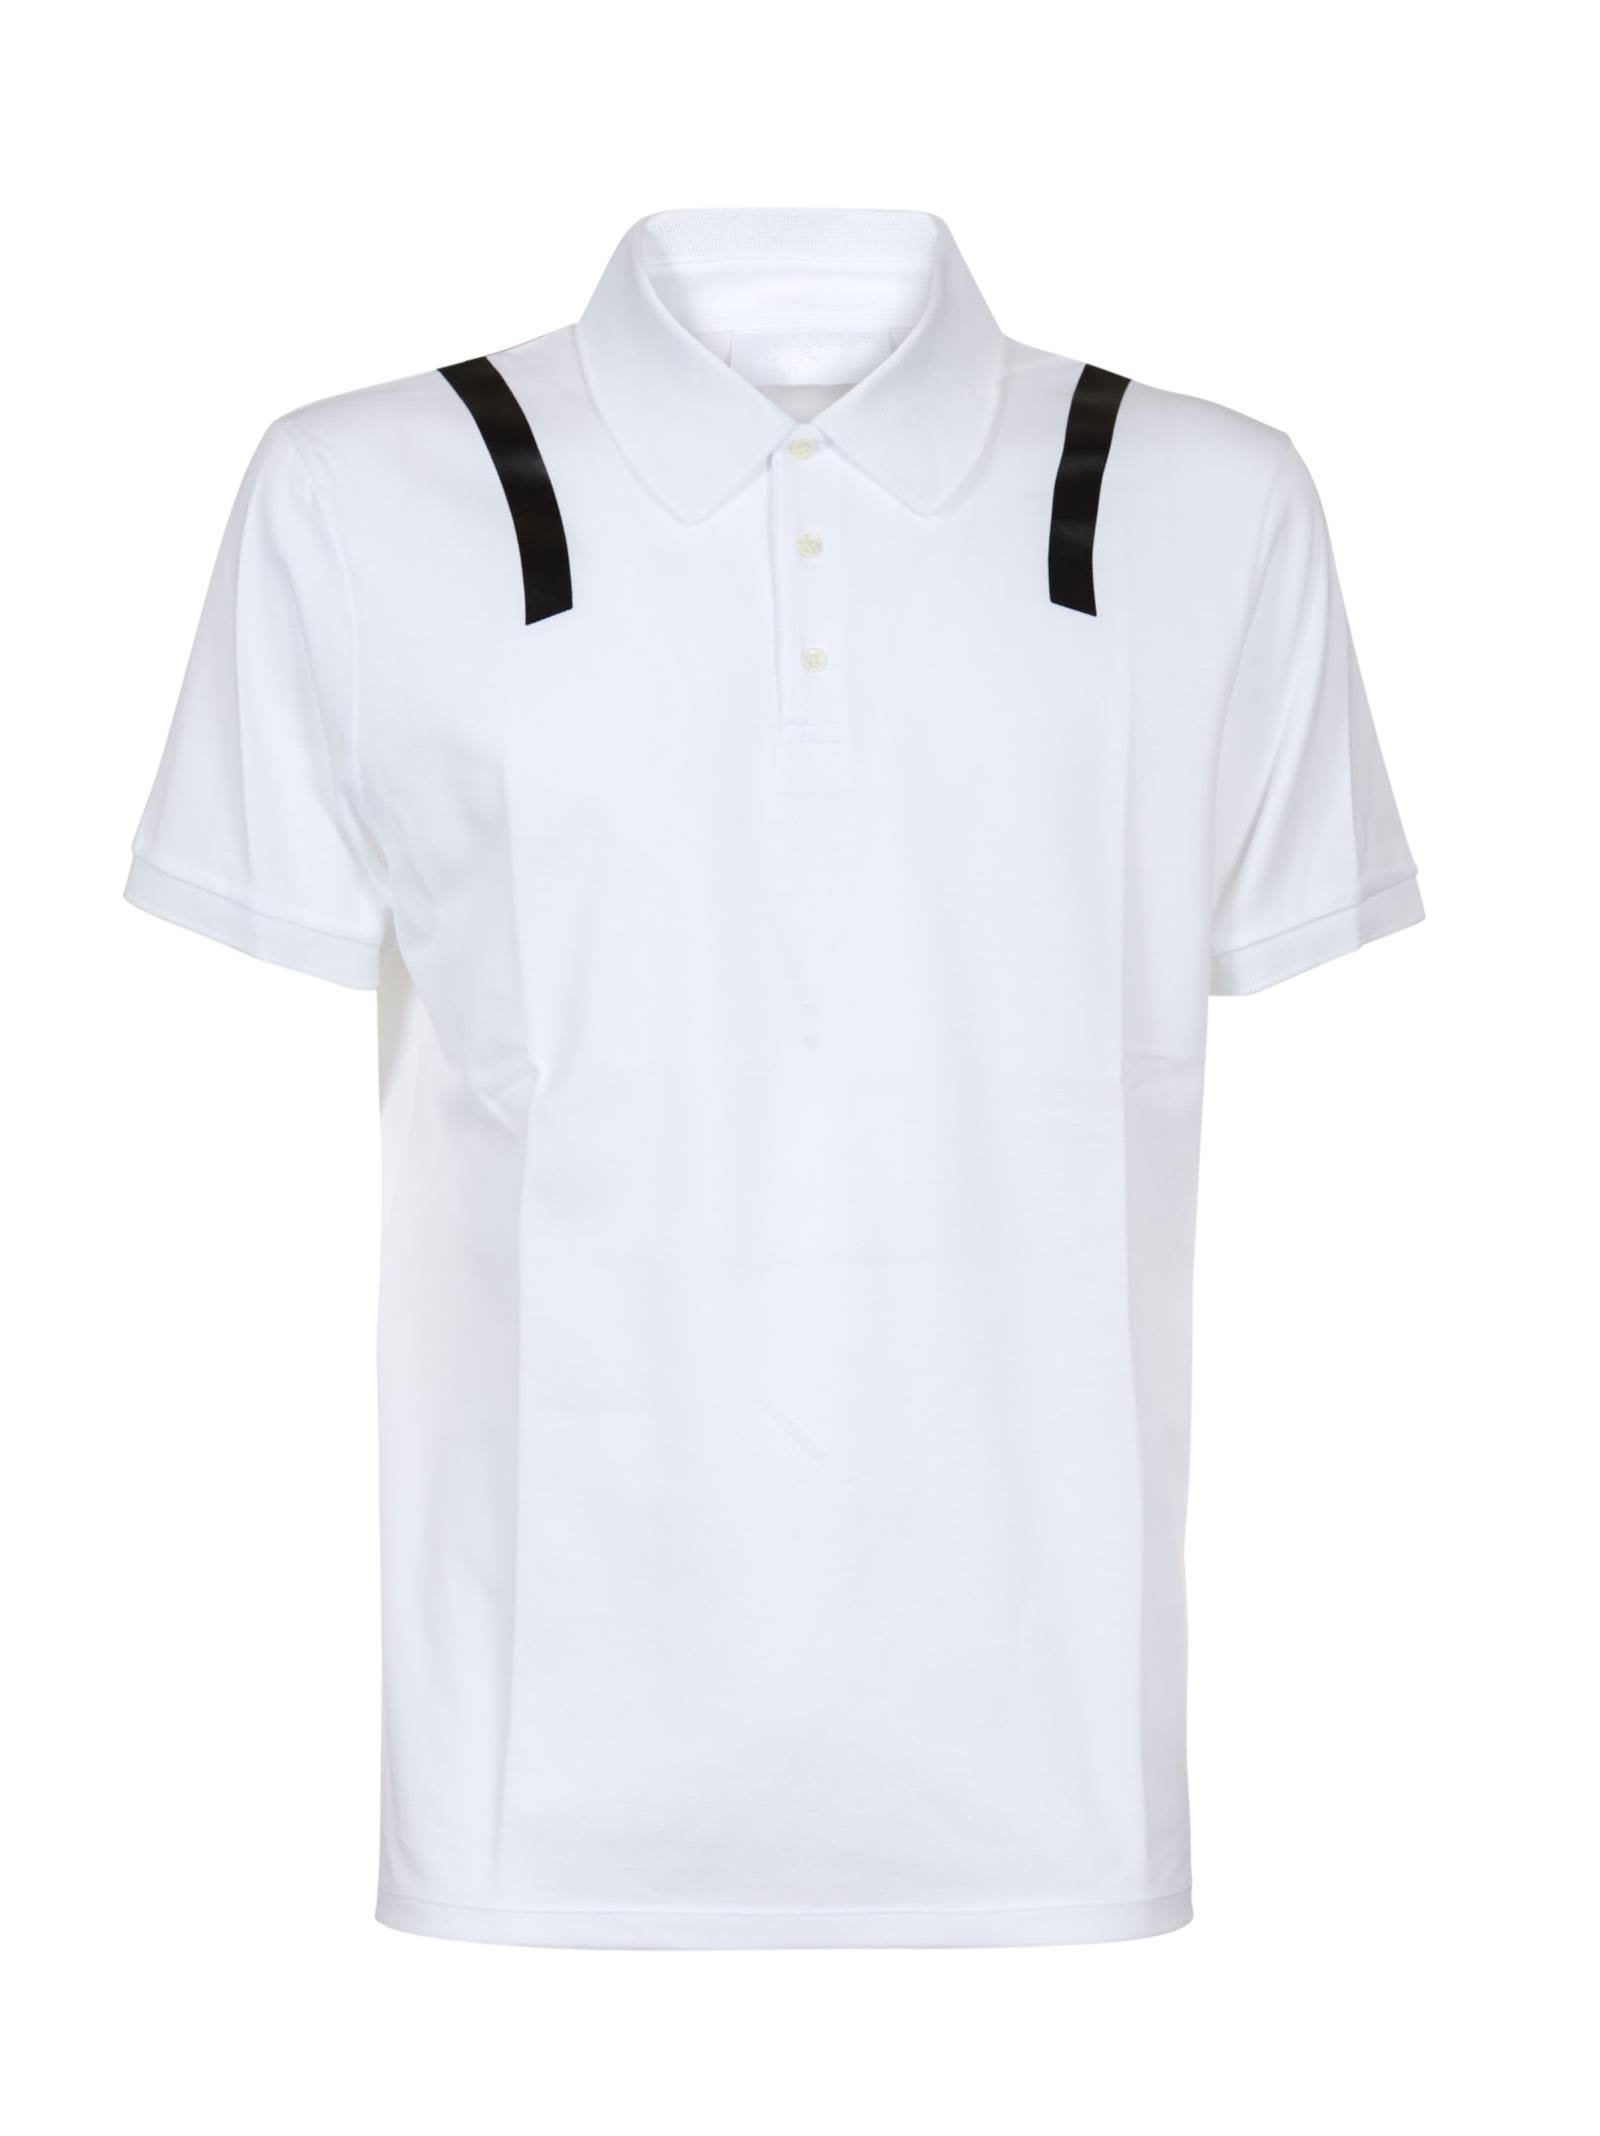 Neil Barrett Stripe Shouldered Polo Shirt